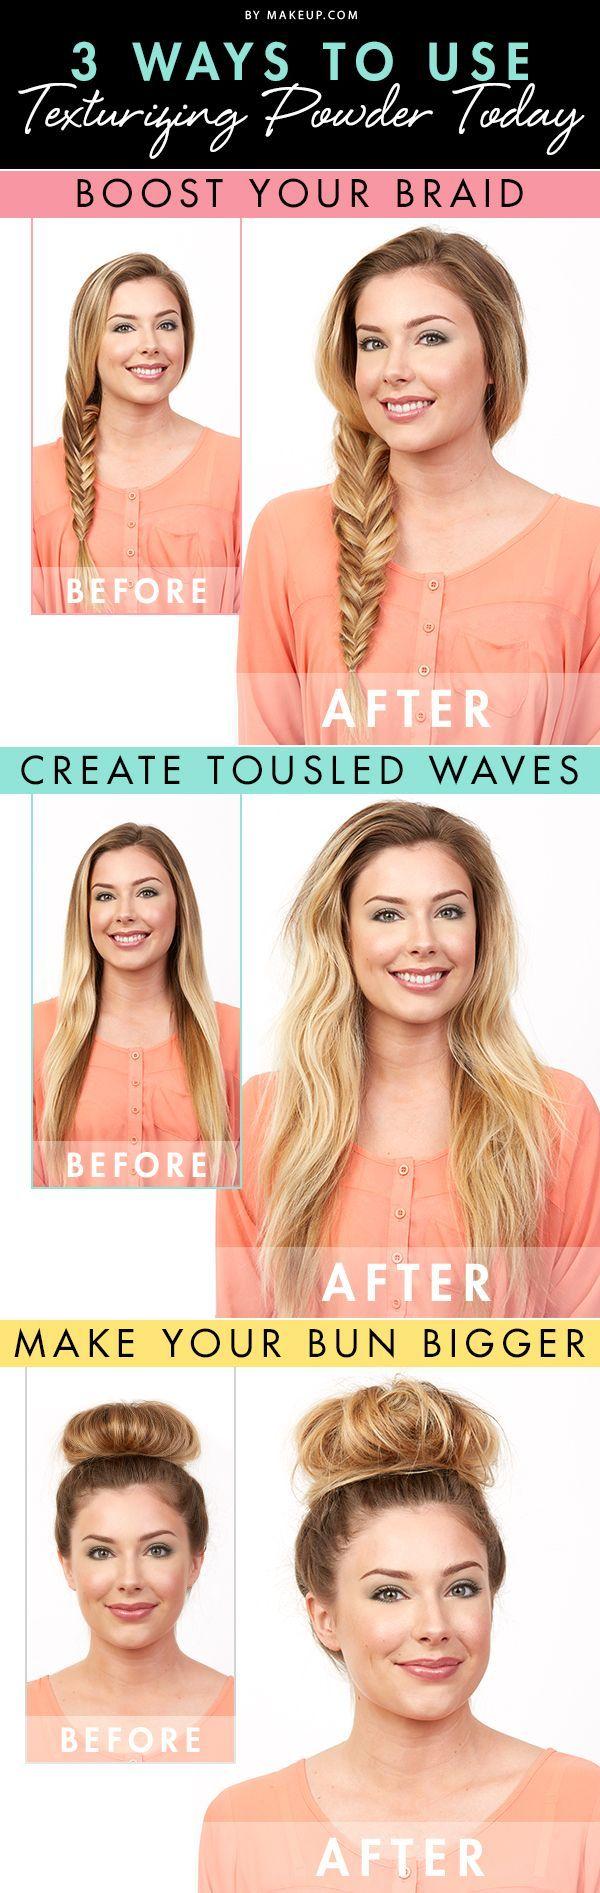 The secret to va-va-voom hair? Texturizing powder!